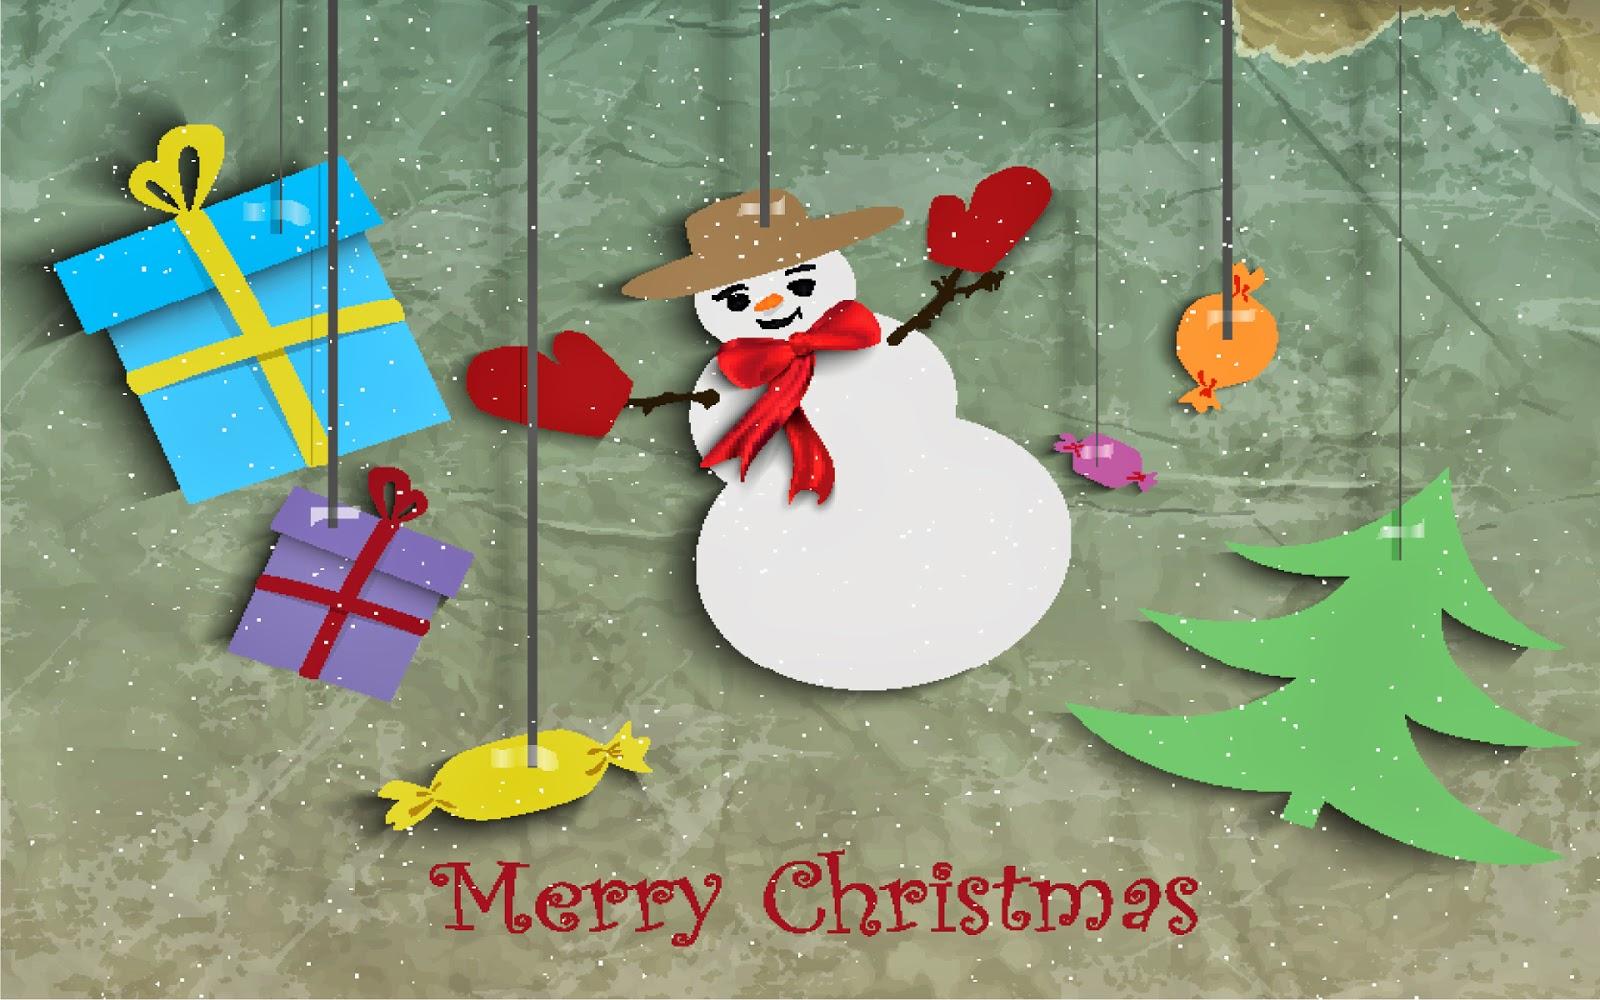 merry-Christmas-paper-cut-cards-images-wallpaper-for-kids-children-family-friends.jpg